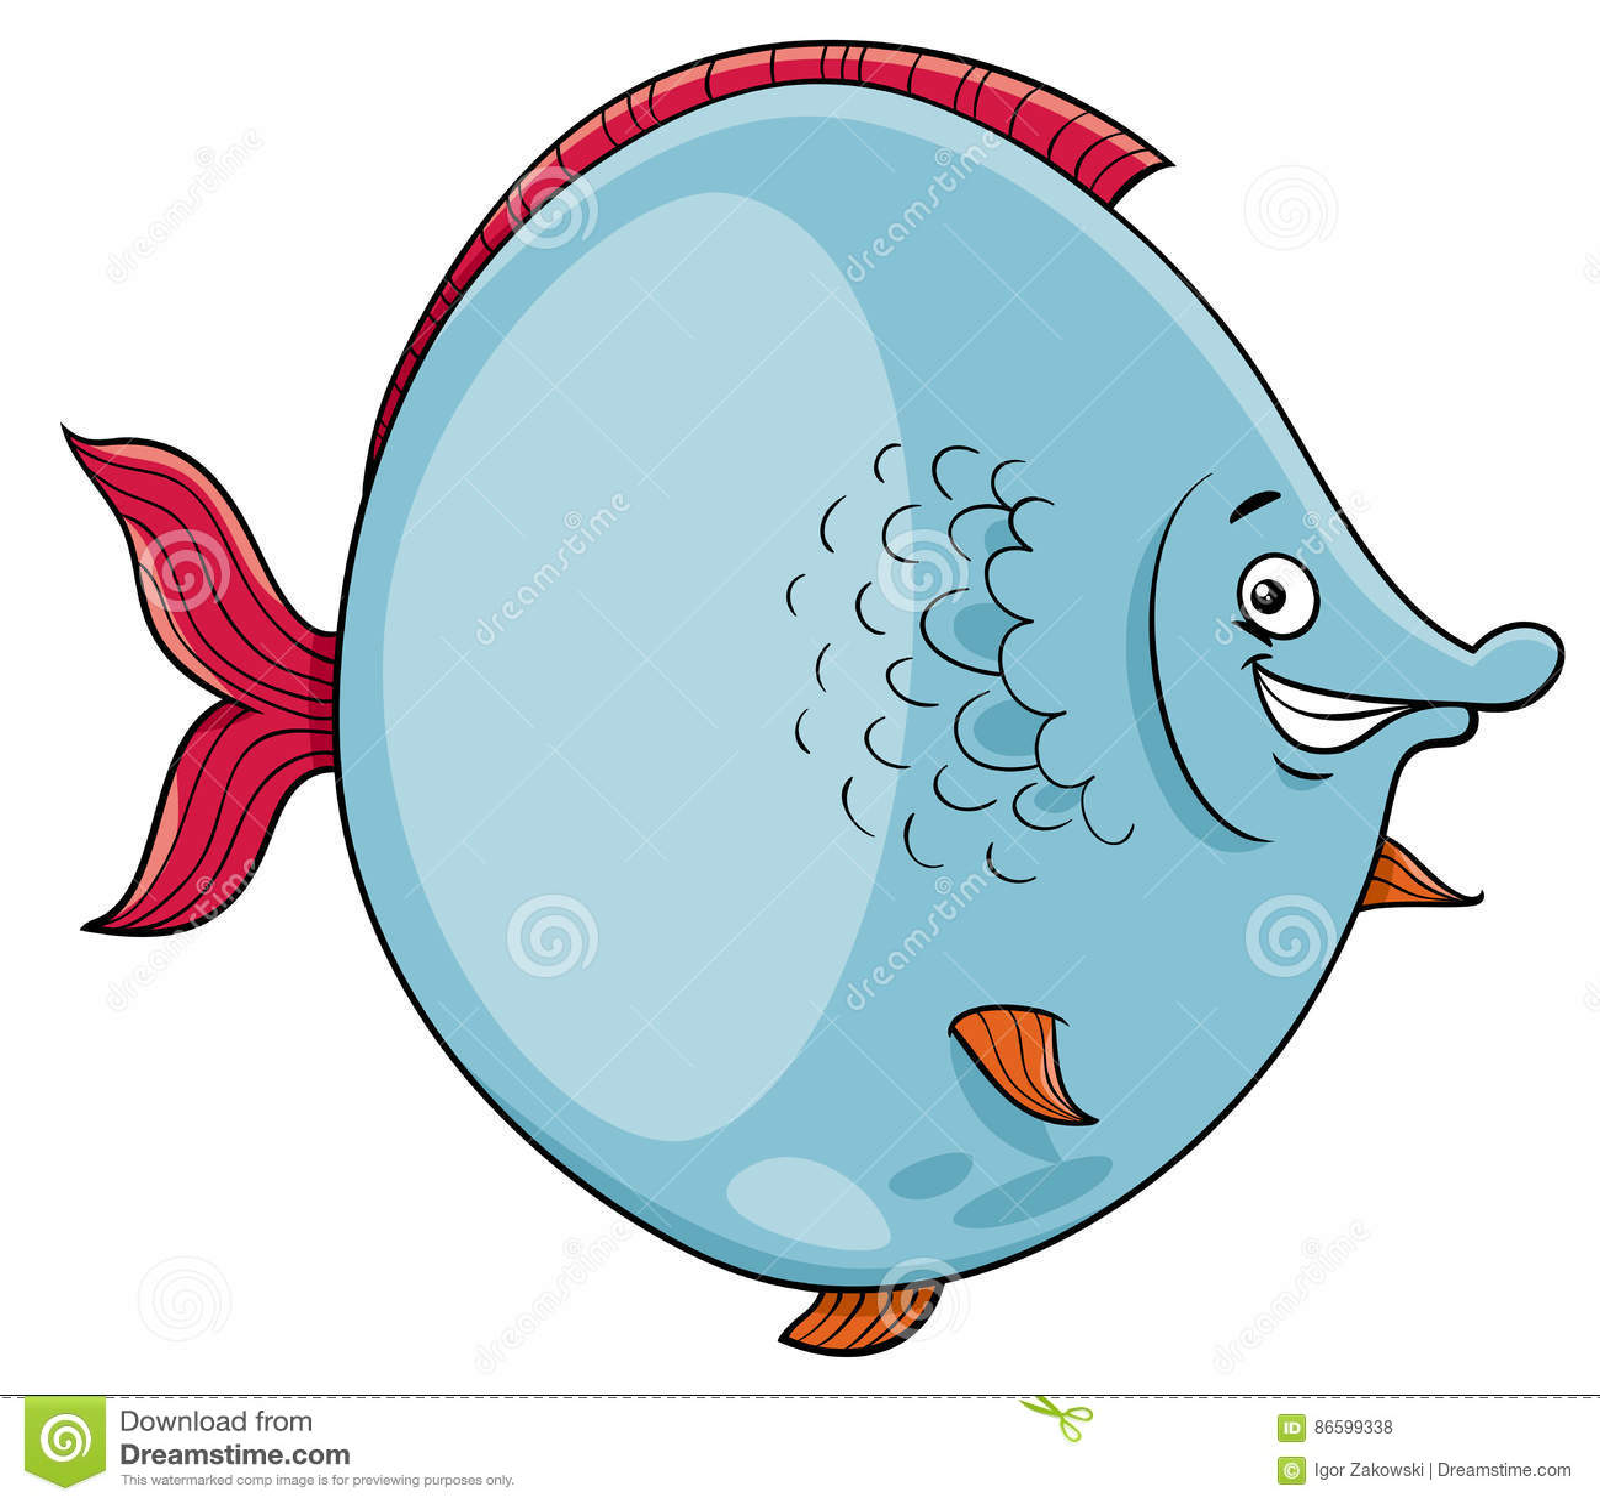 Big fish cartoon character stock vector illustration of large download big fish cartoon character stock vector illustration of large 86599338 thecheapjerseys Choice Image